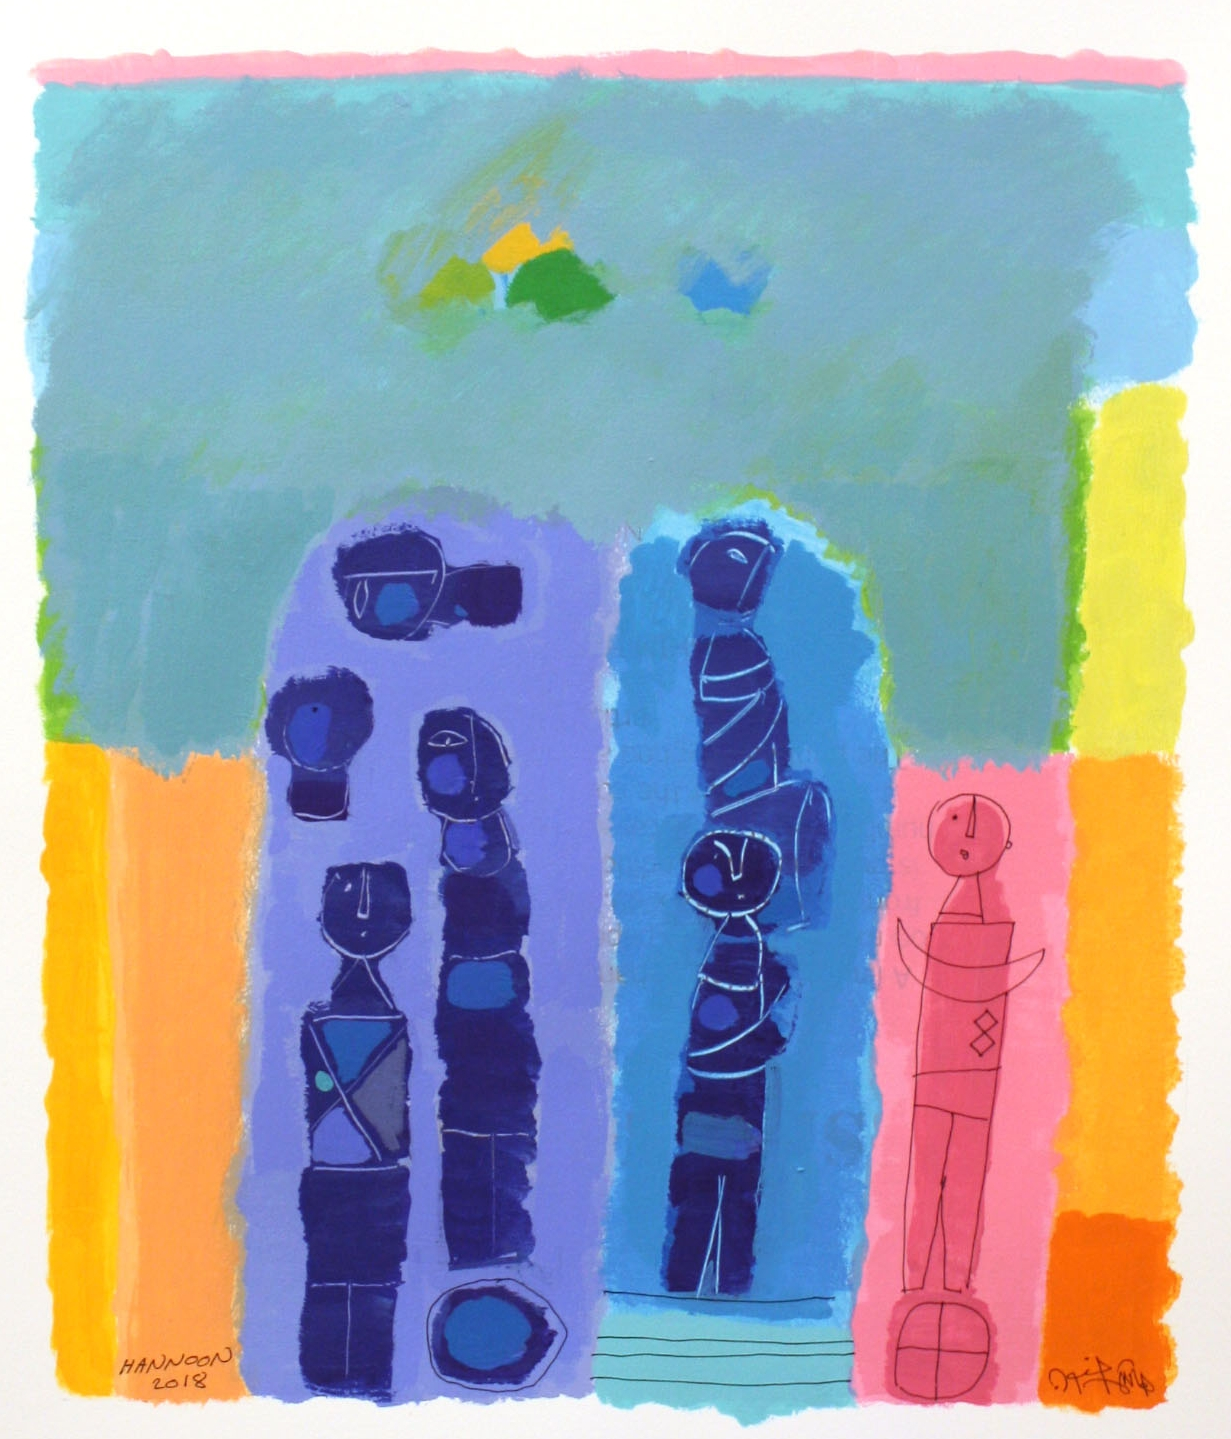 Green Village I <br> Hashim Hannoon <br> 24.5 x 19.5 <br> Acrylic on Paper <br> $ 2000